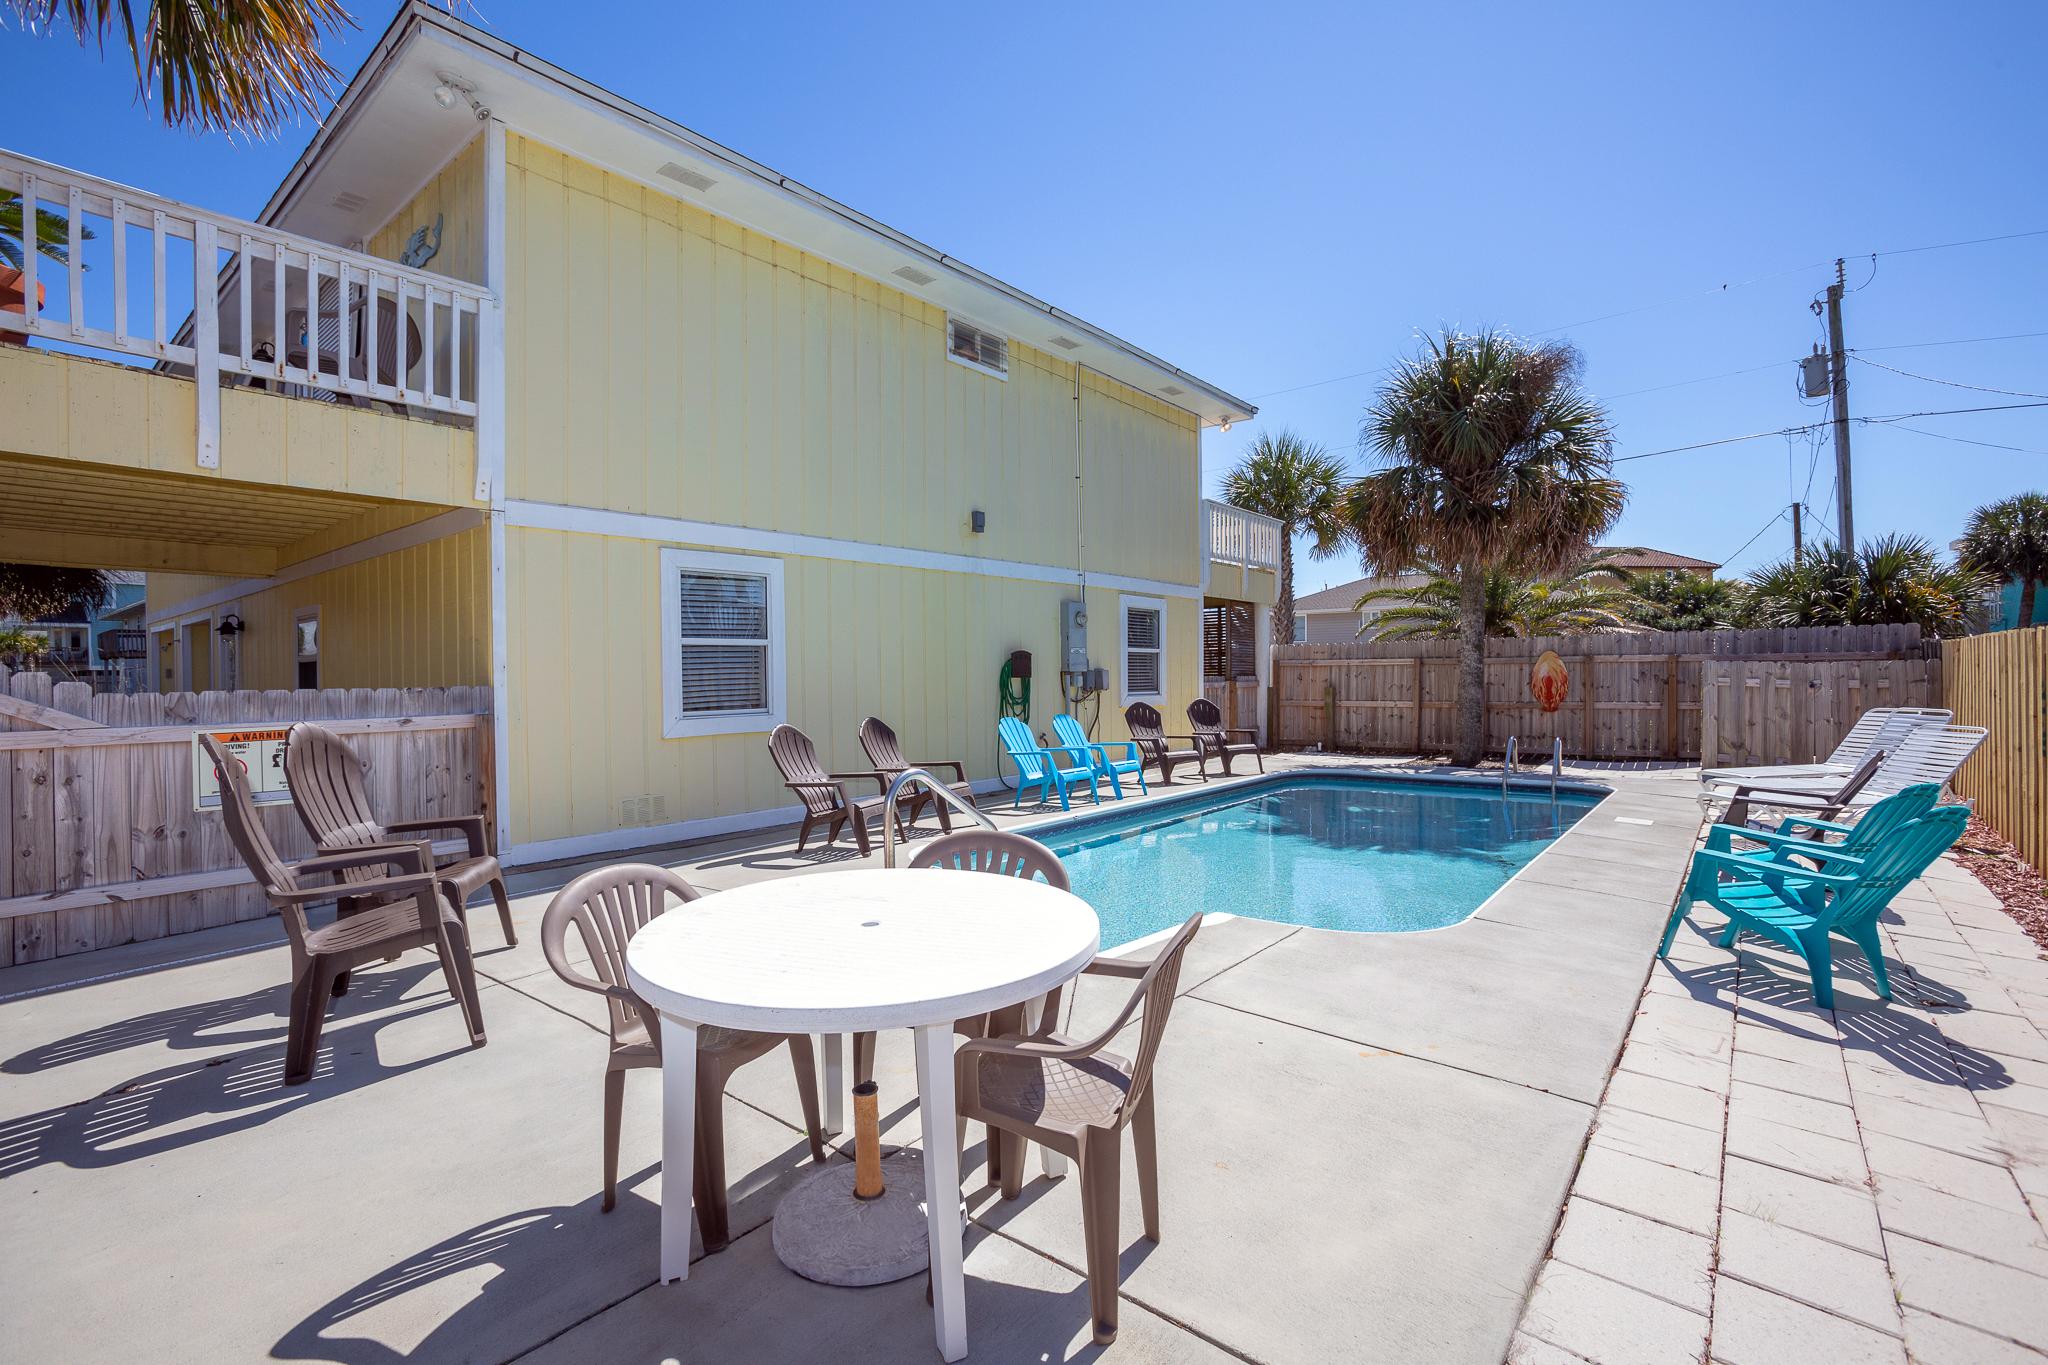 Maldonado 1015 - Sea the Big Picture House/Cottage rental in Pensacola Beach House Rentals in Pensacola Beach Florida - #40